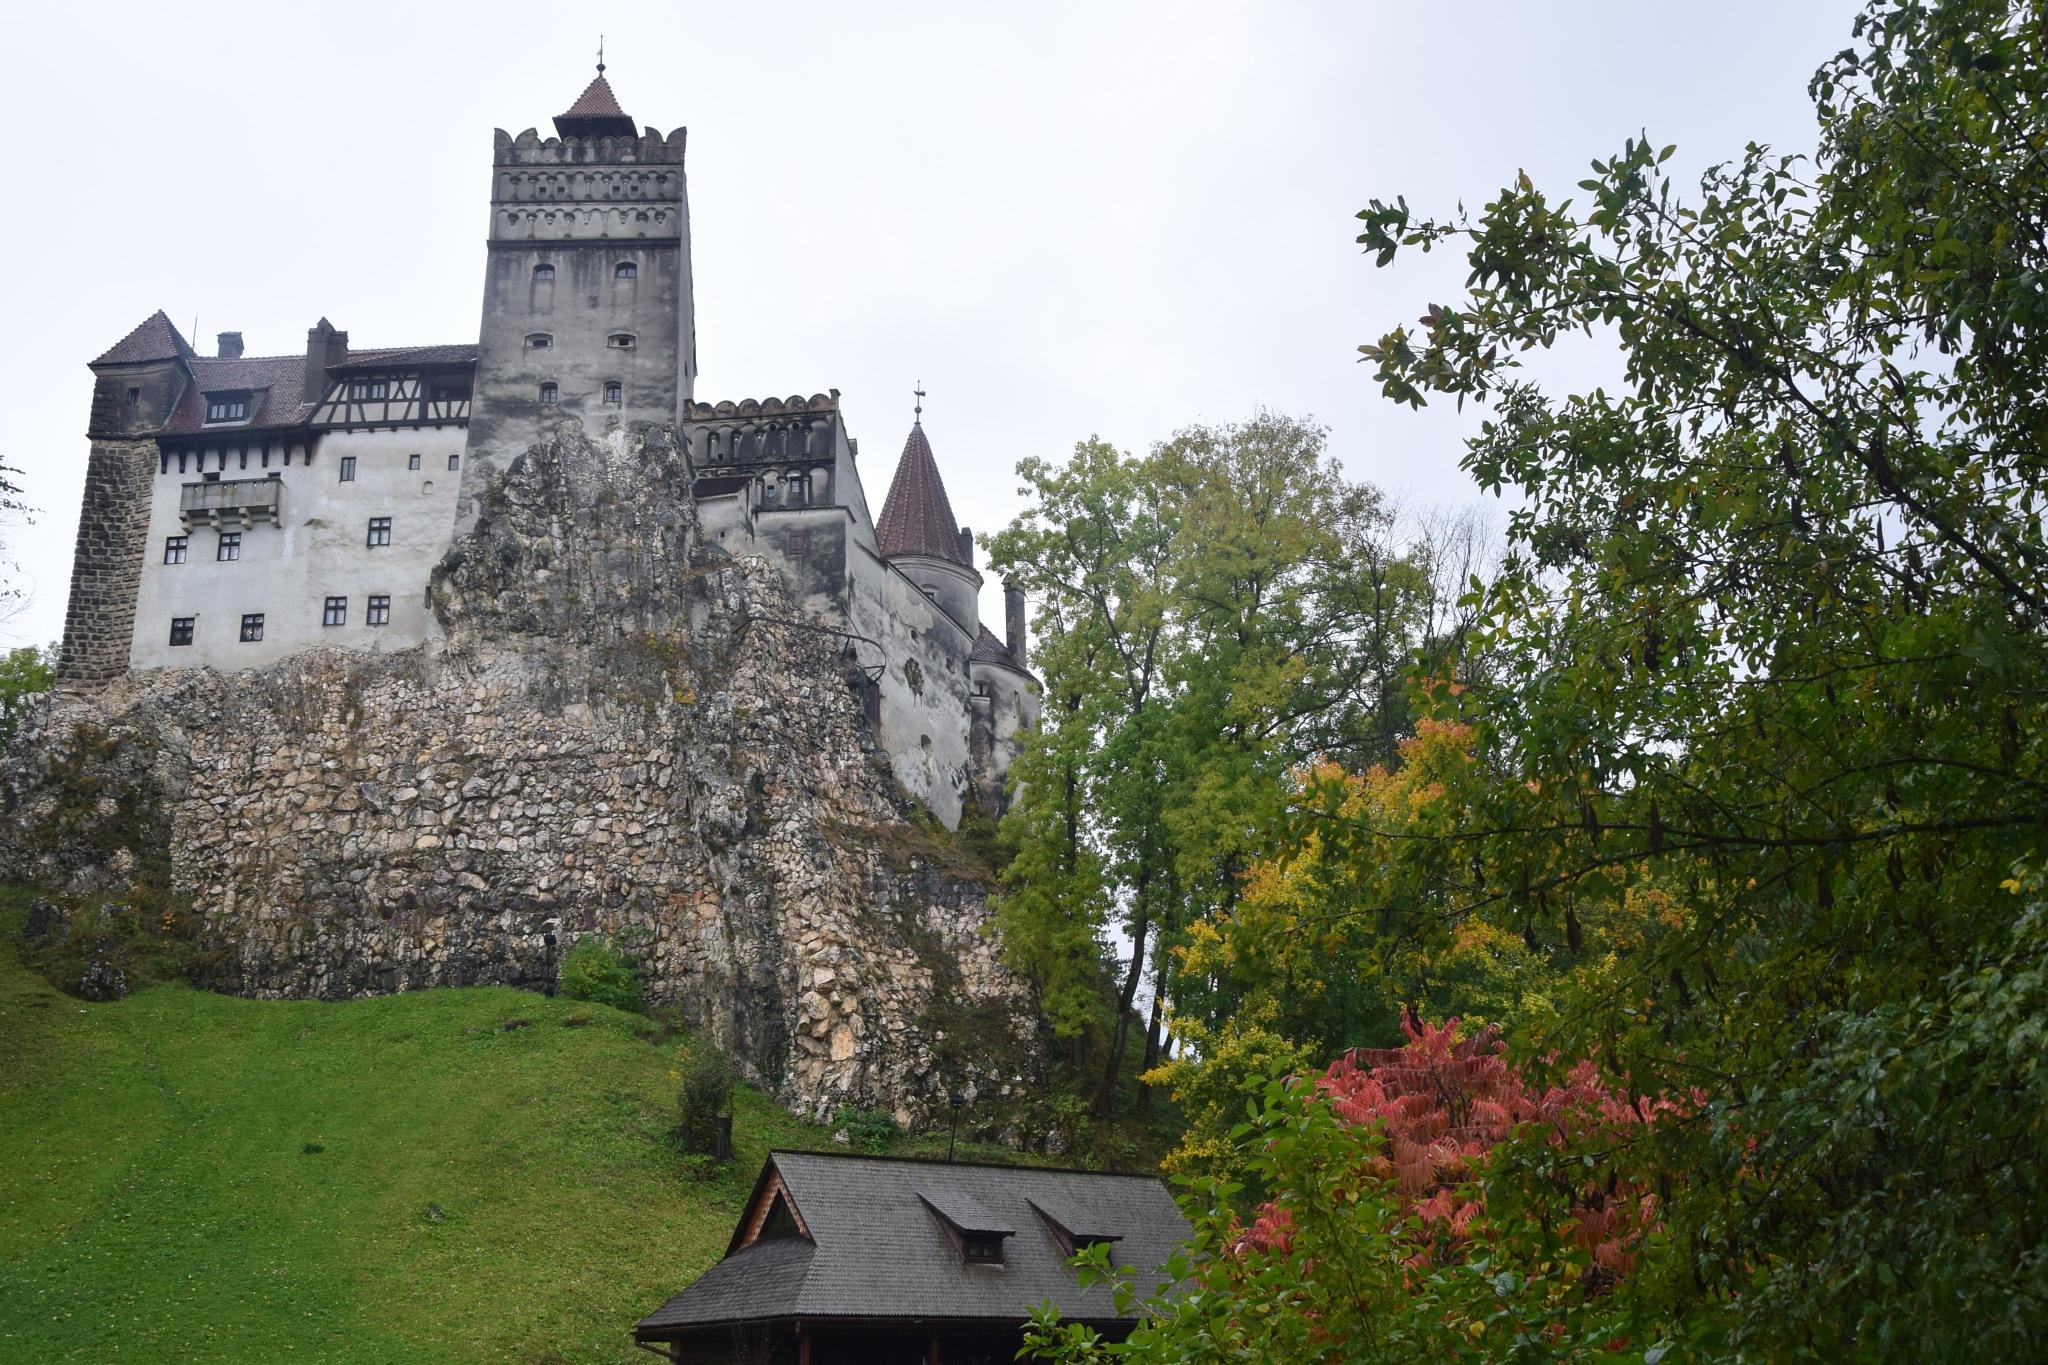 Bran Castle 2 by GraemeLeePollard